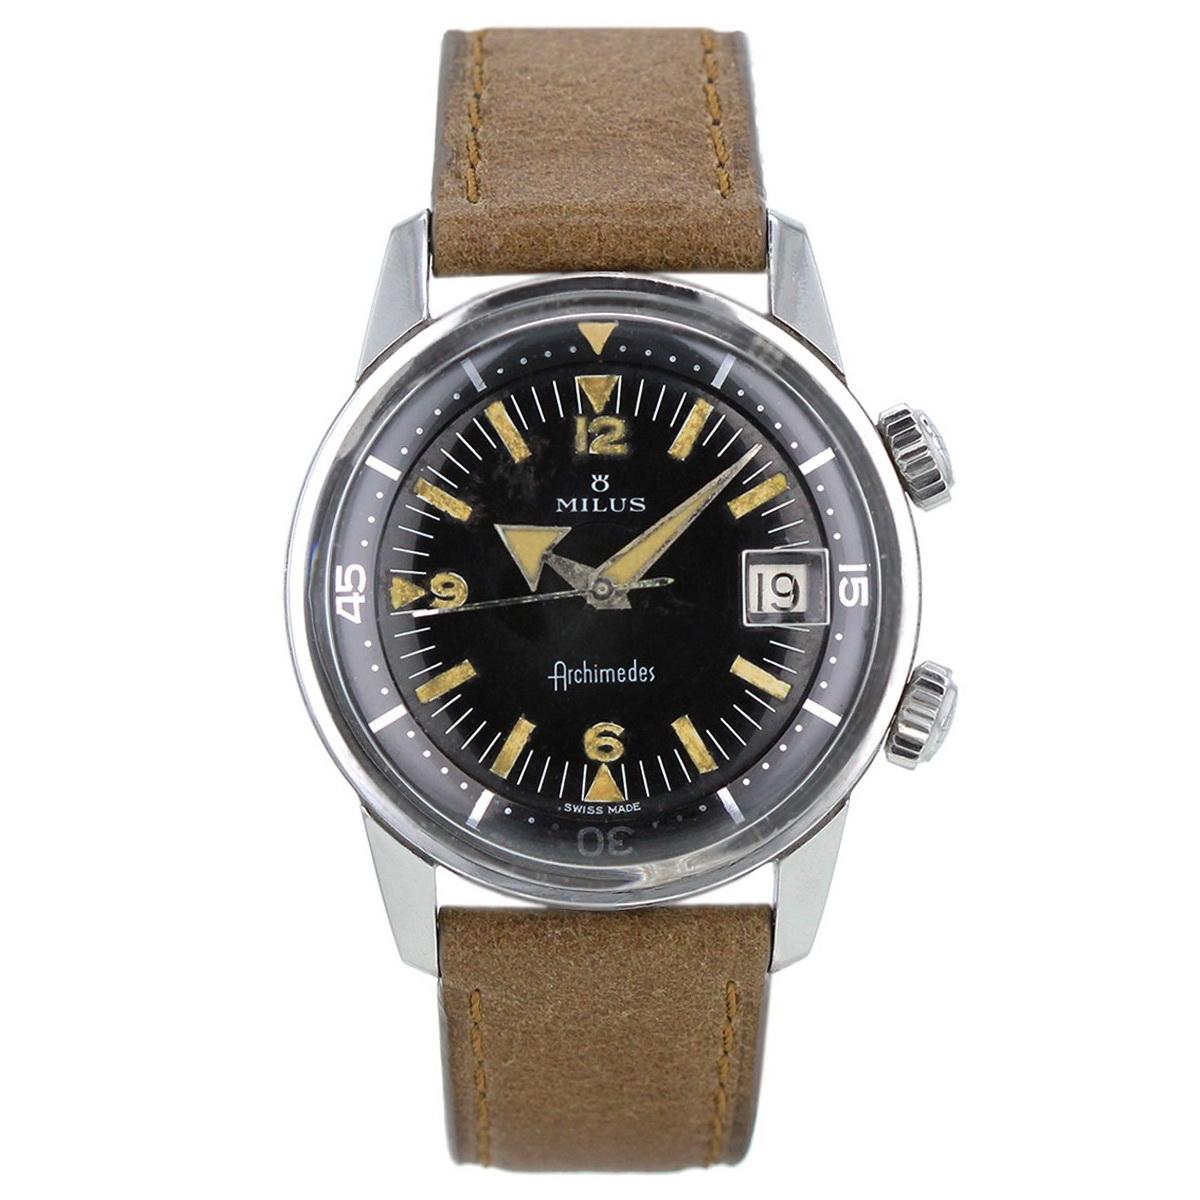 Milus Watch's new Archimedes Vintage+Archimèdes+Super+Compressor+by+MILUS+1970